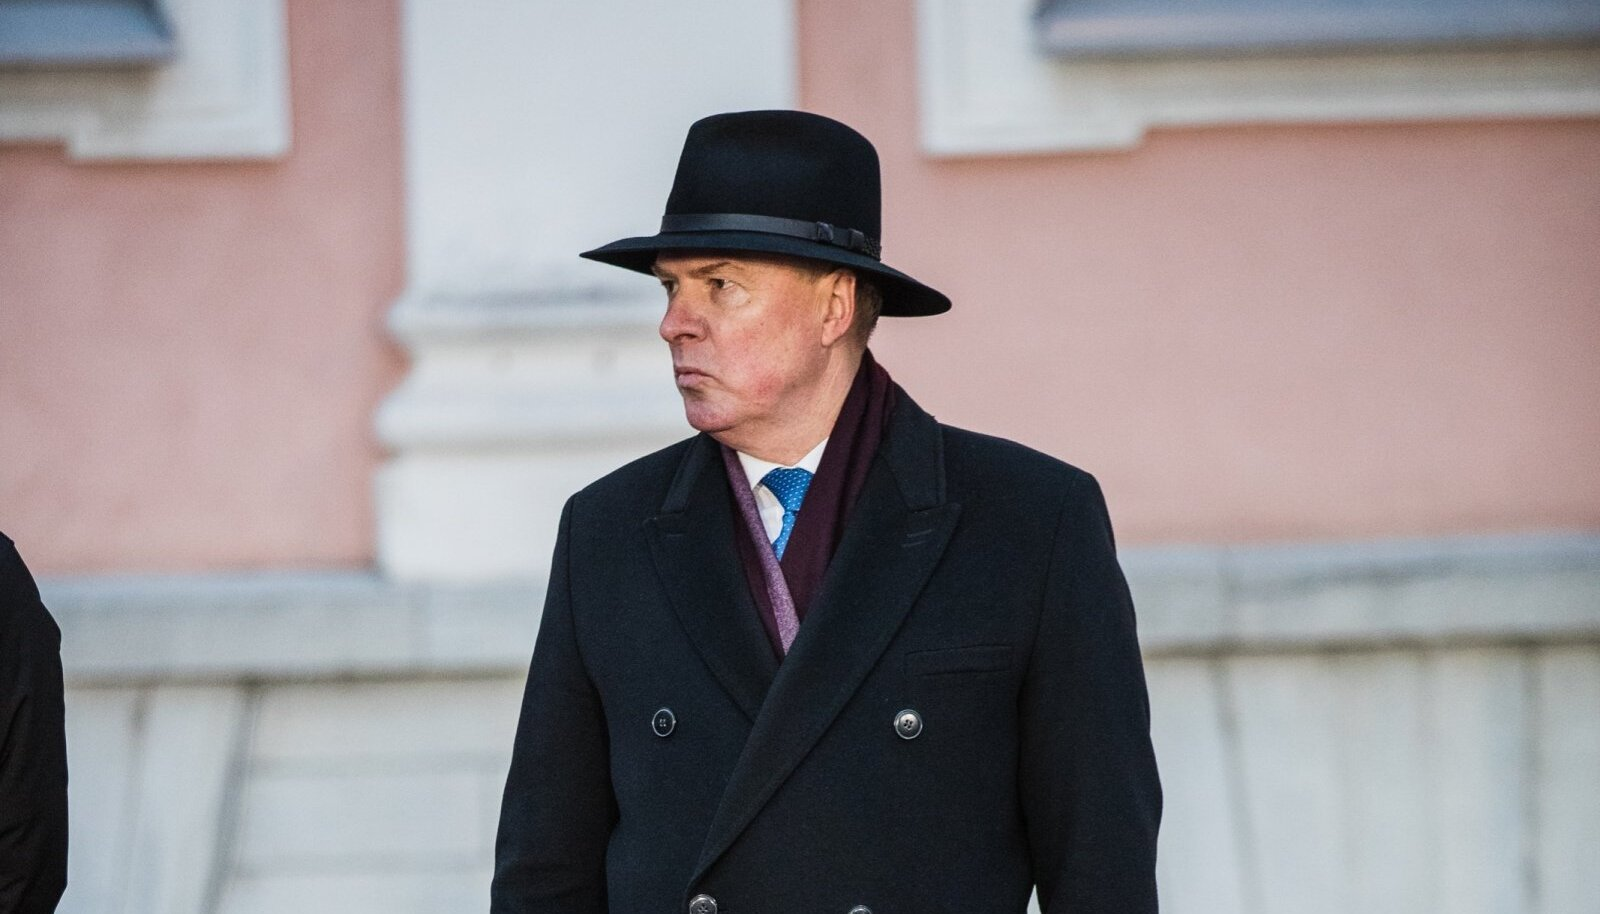 Kalle Laanet